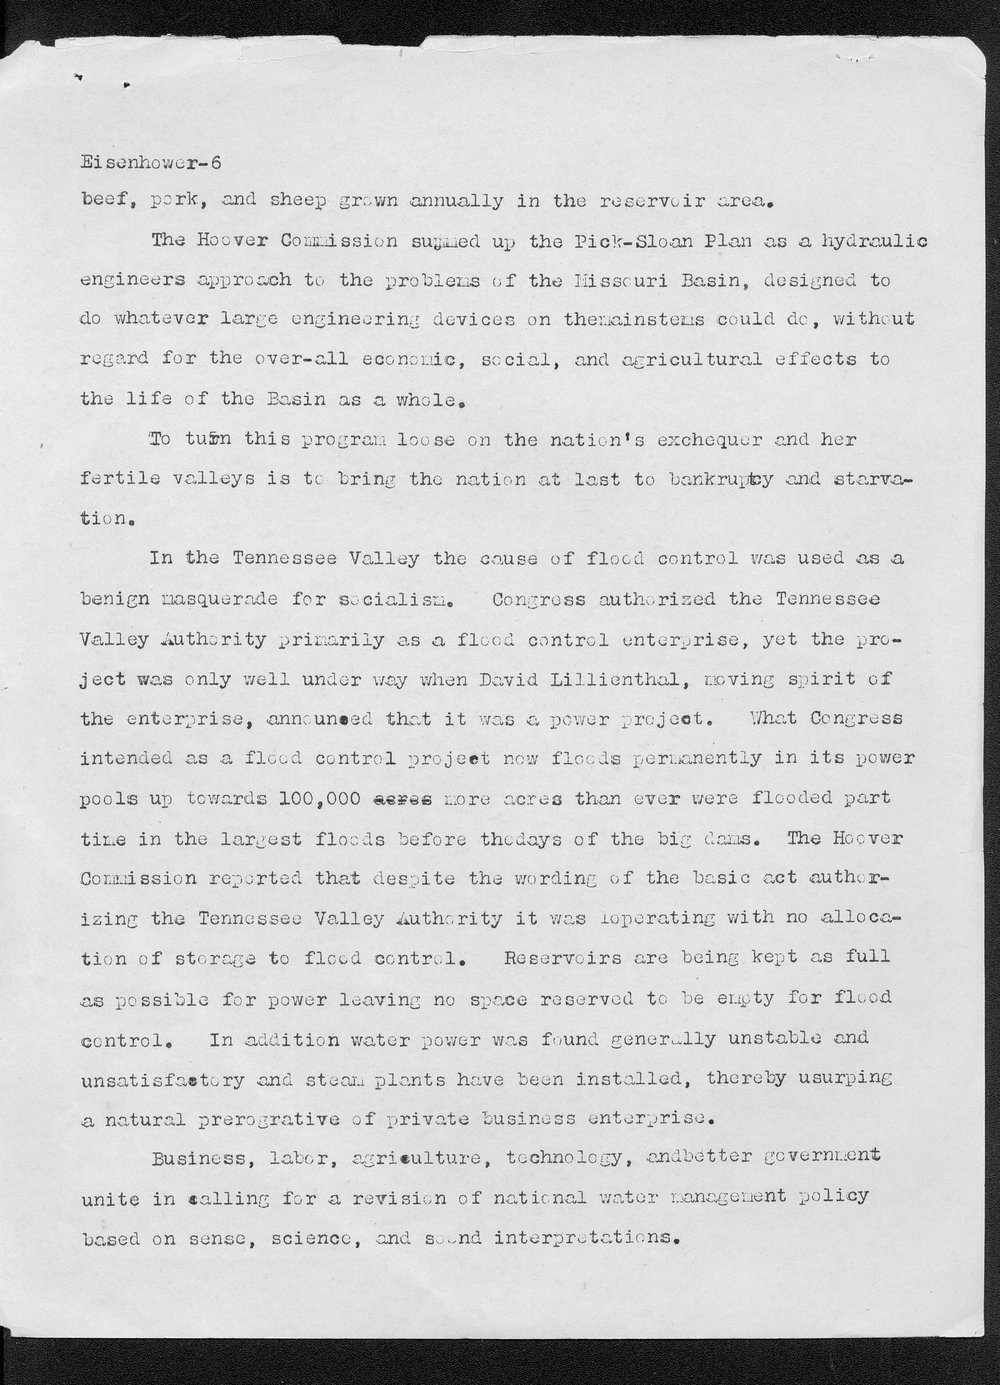 Edith Monfort to Dwight Eisenhower - 6